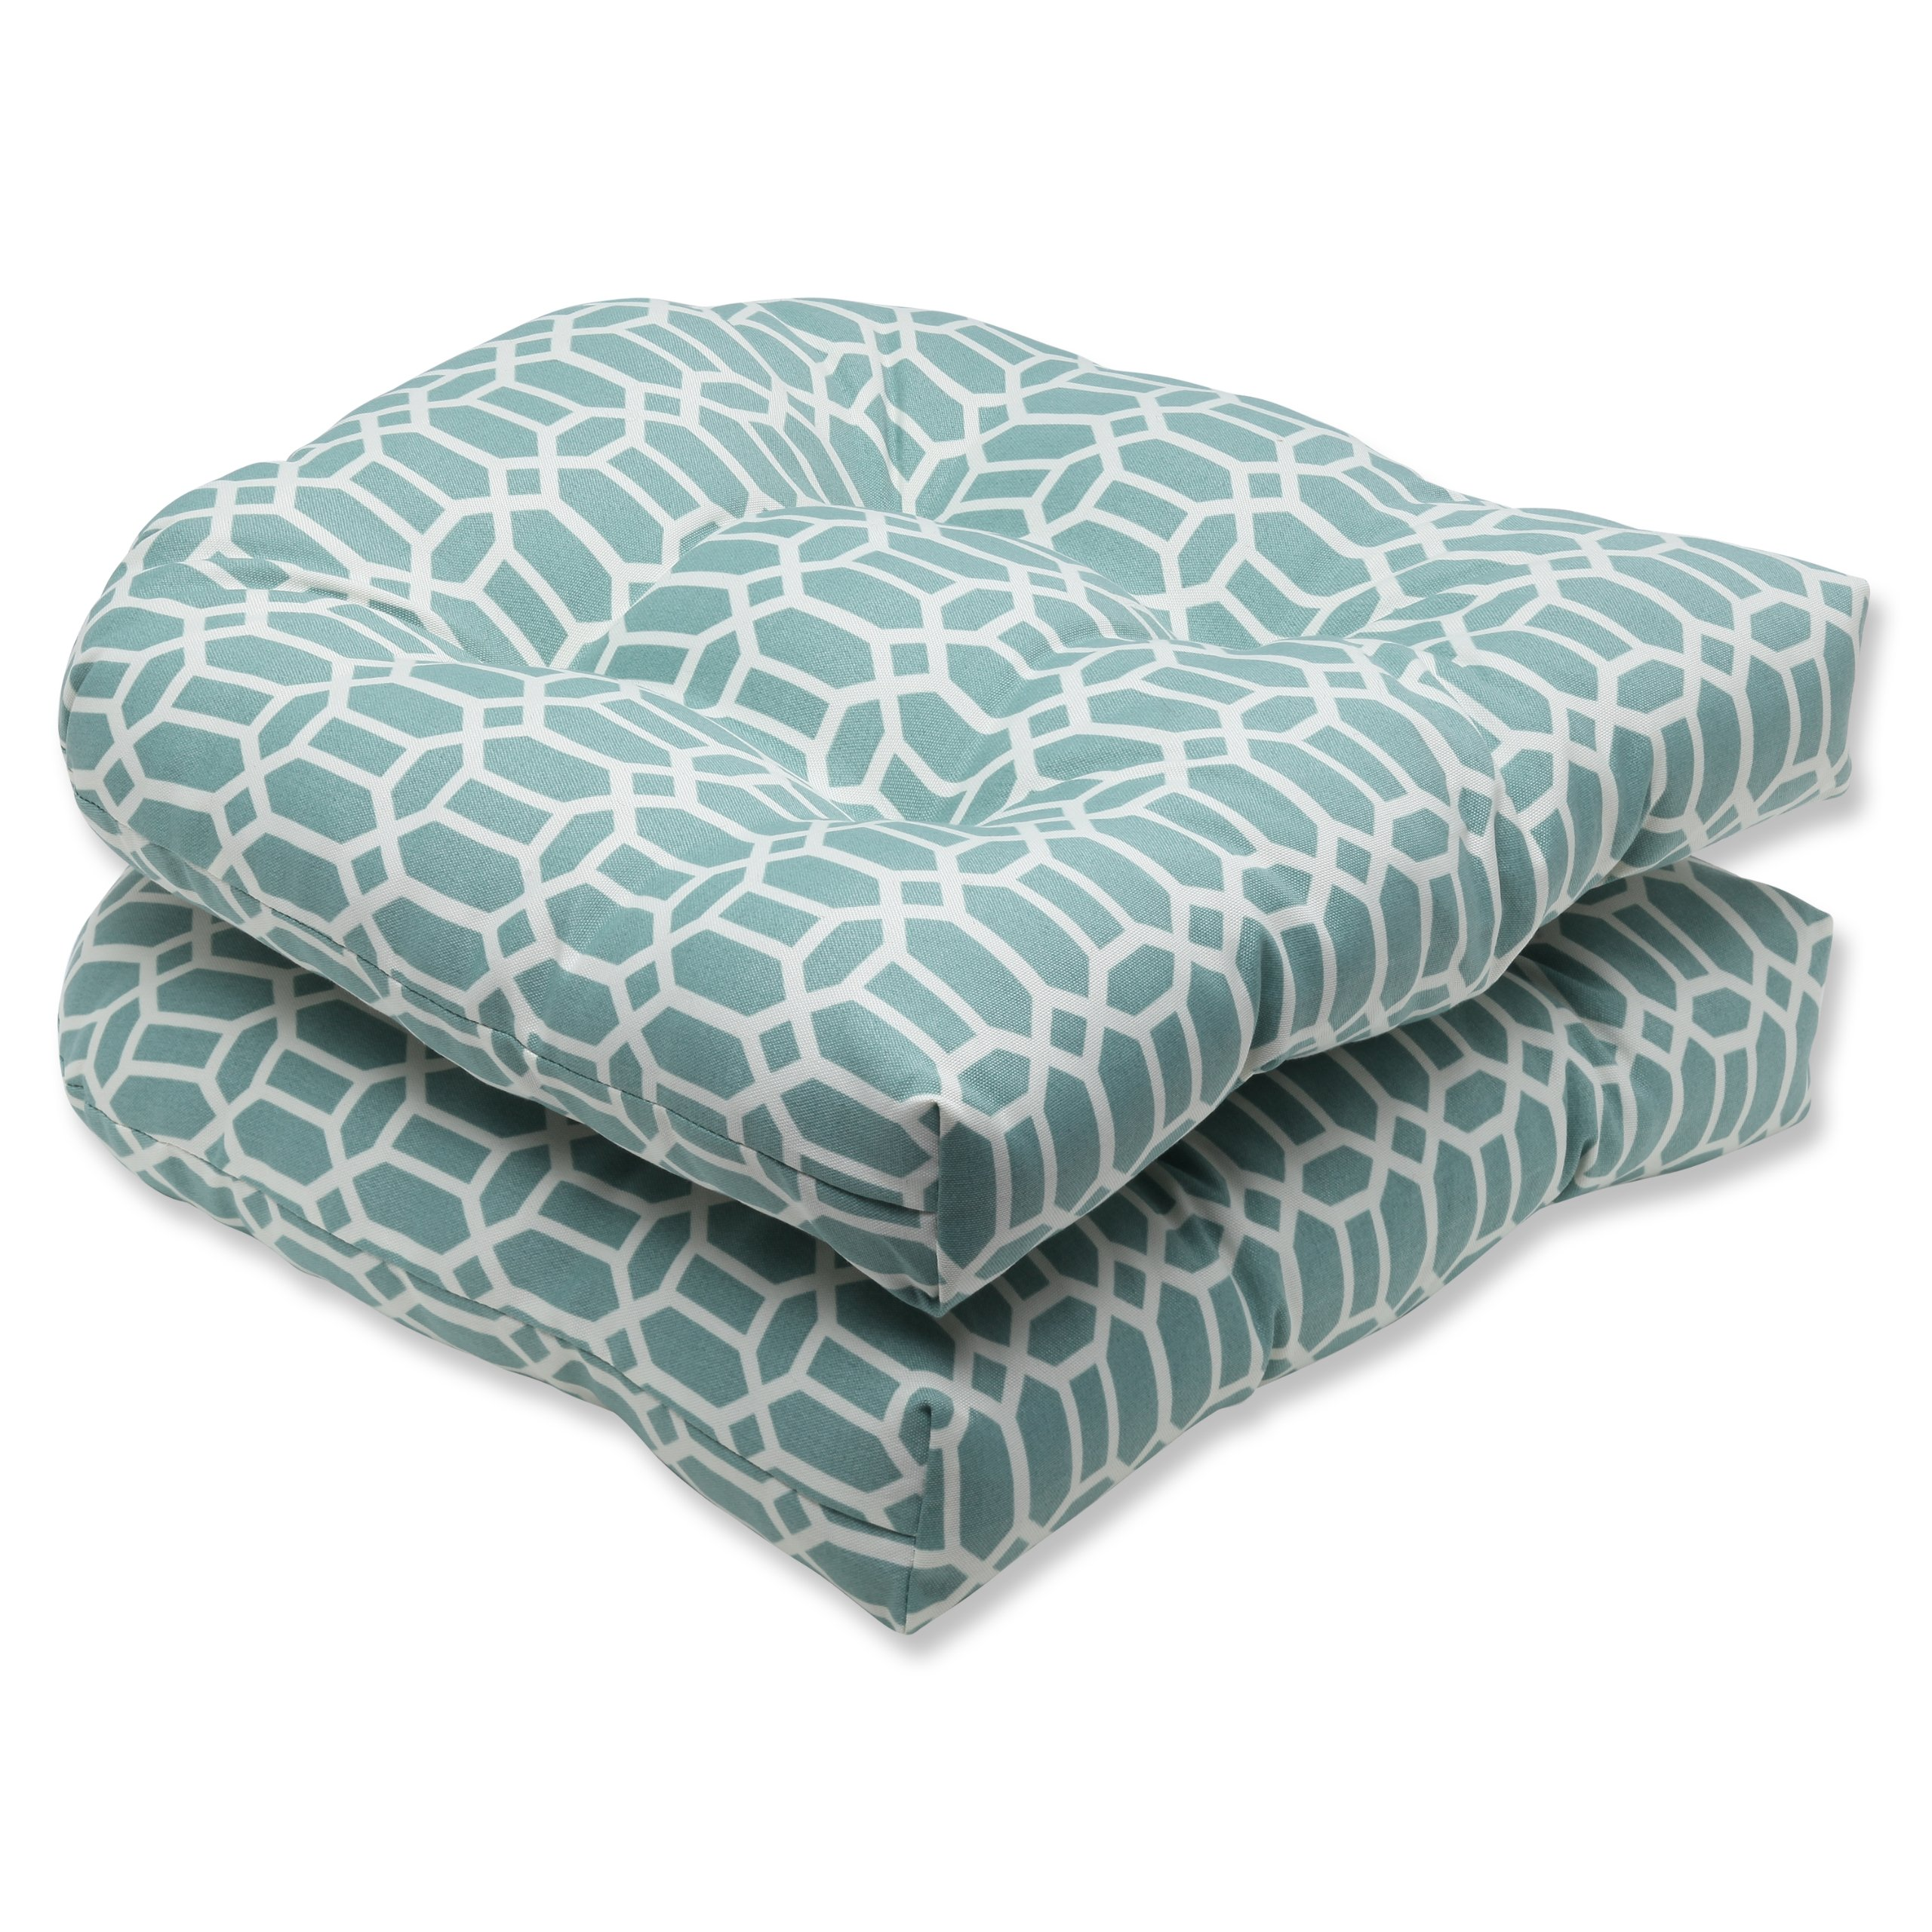 Pillow Perfect Outdoor Rhodes Quartz Wicker Seat